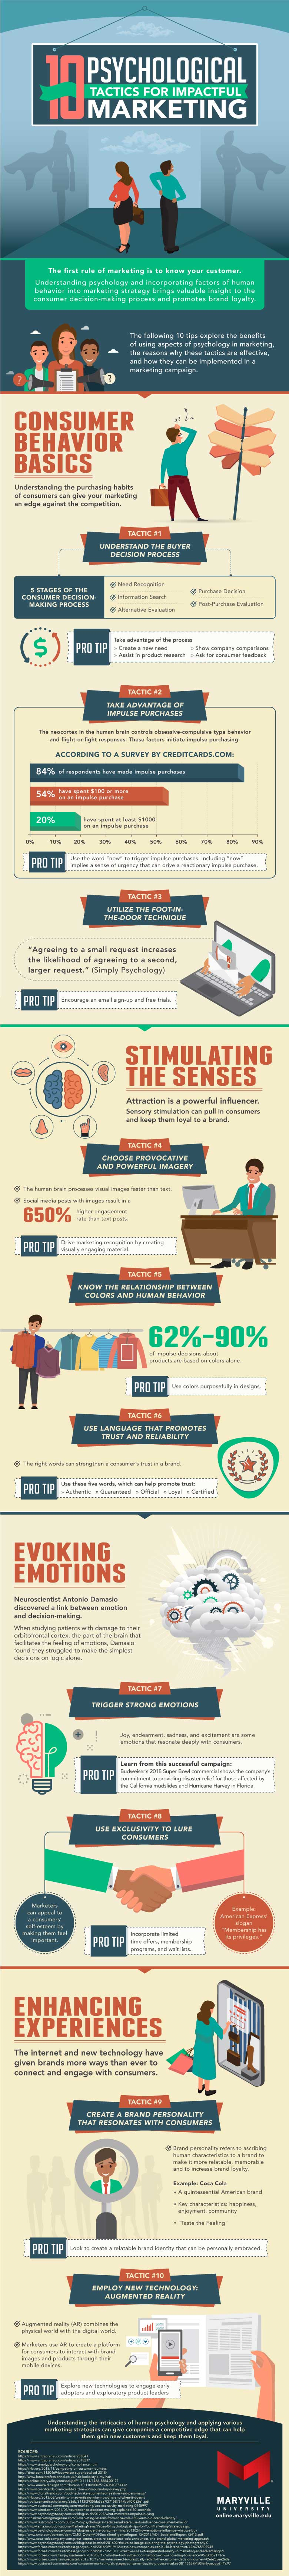 how to use marketing psychology